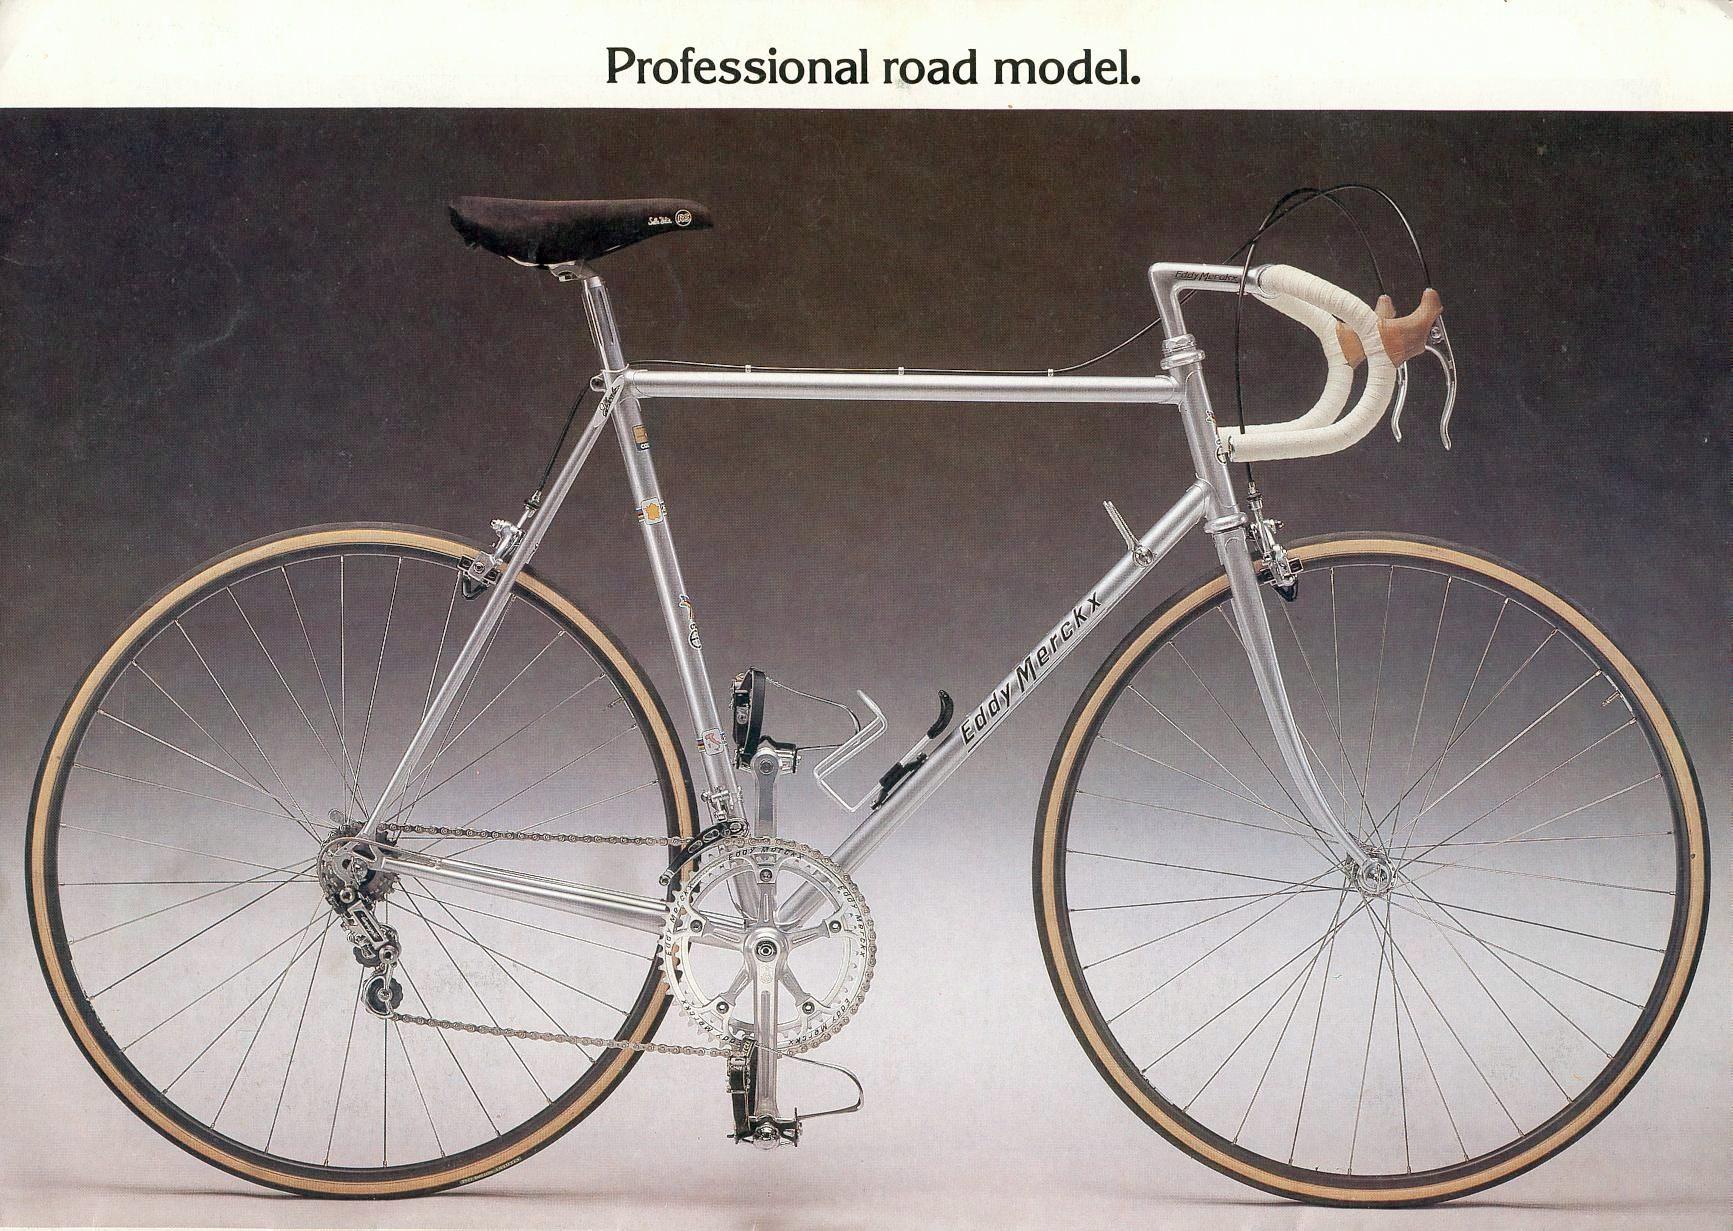 Eddy-Merckx-Professional